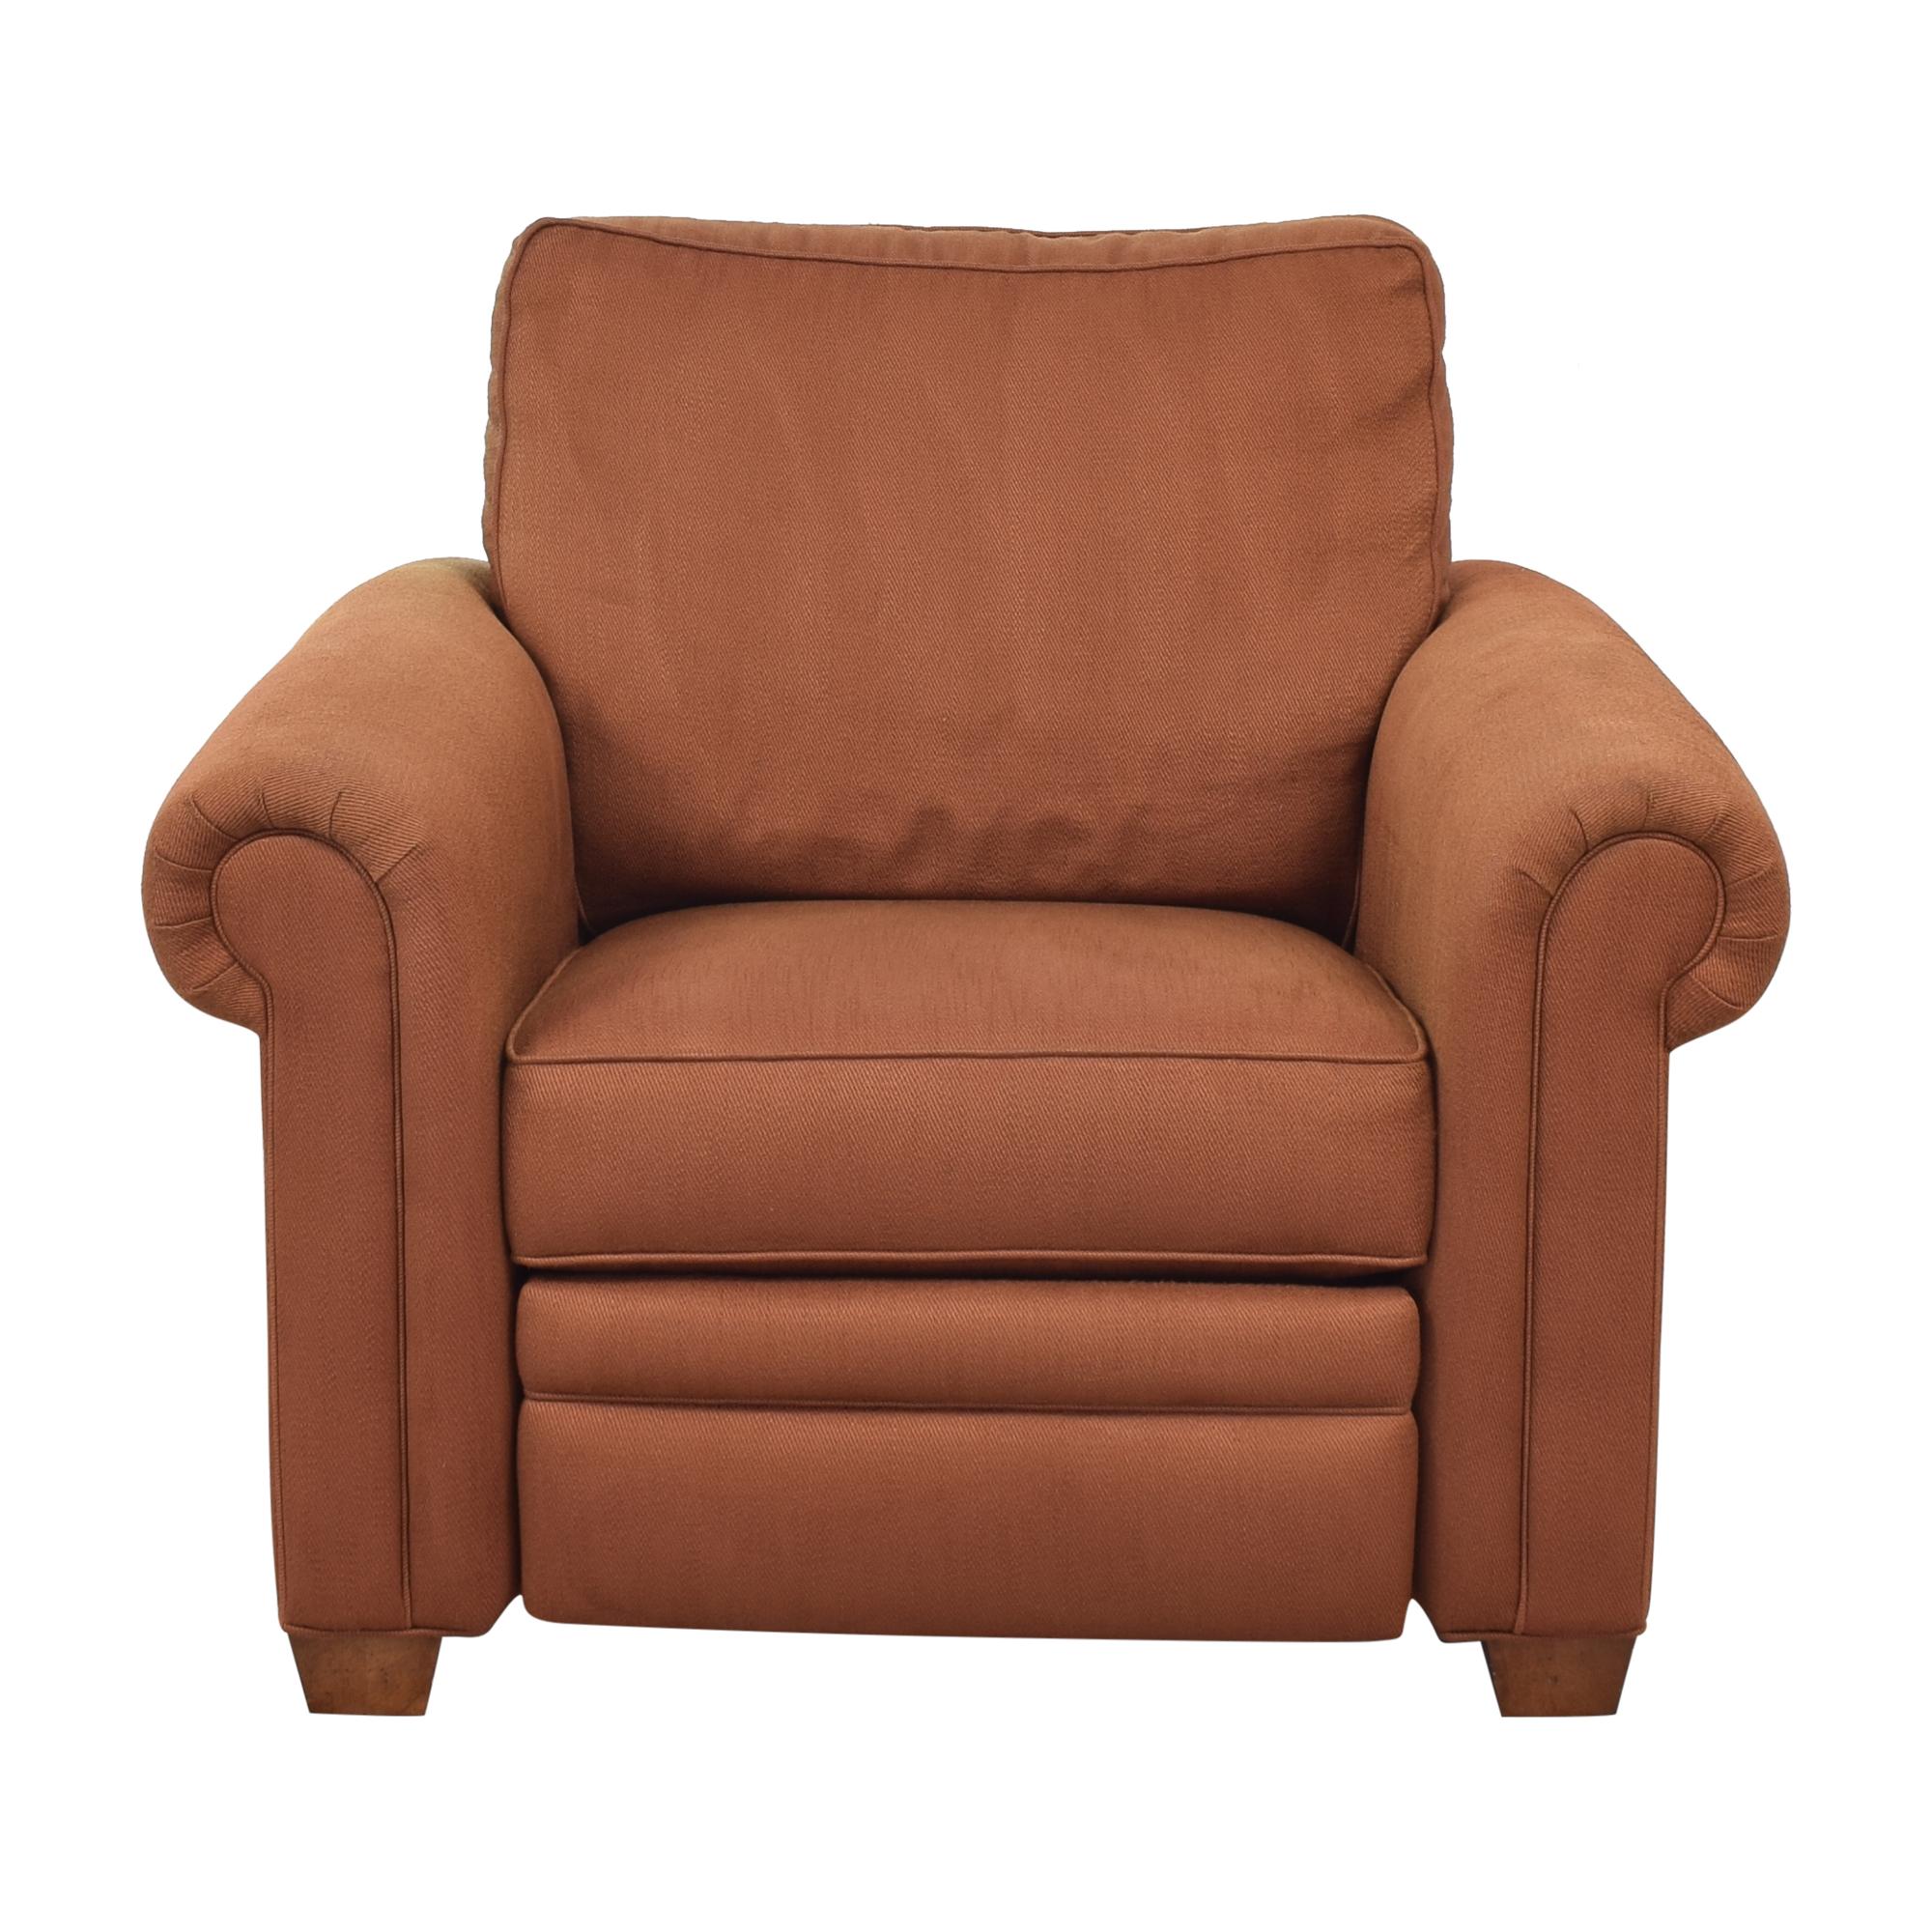 Ethan Allen Ethan Allen Conor Recliner Chairs